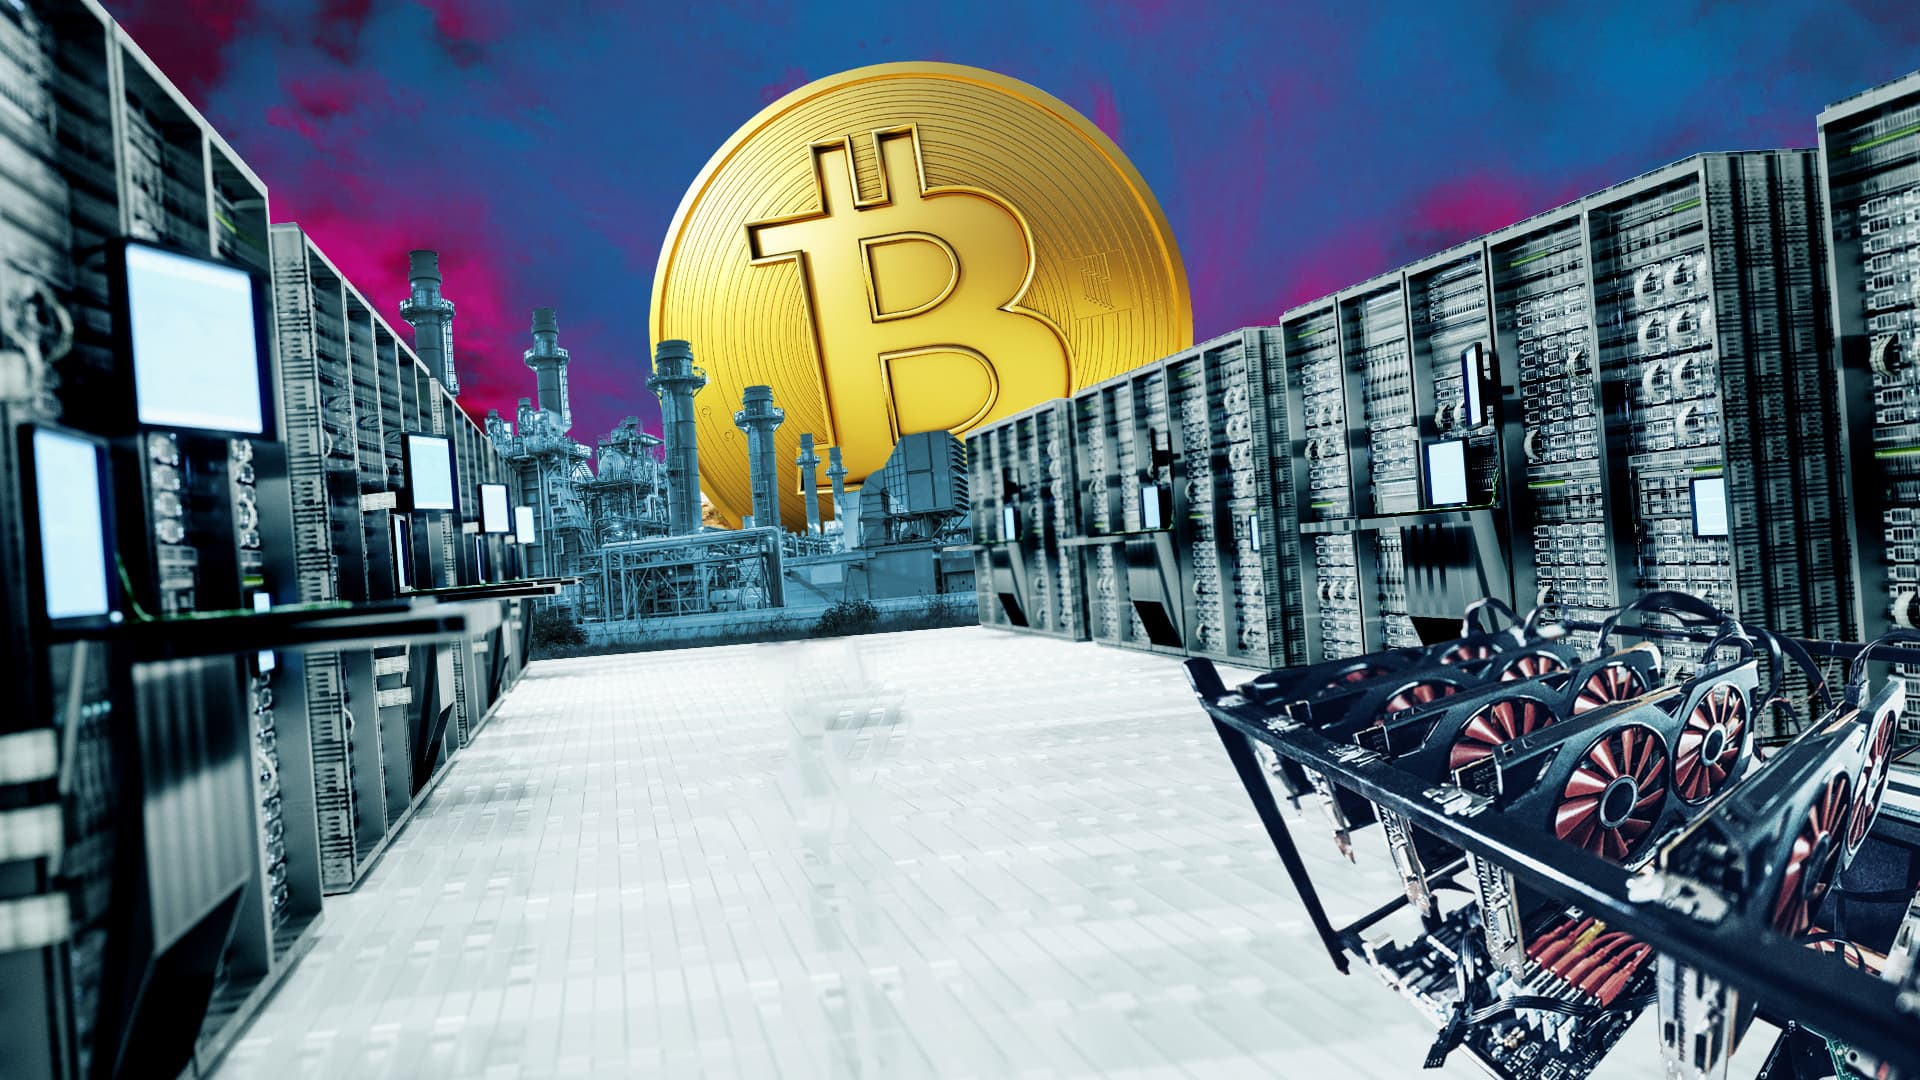 Bitcoin Risks 'Spiraling Price' on Environment, Regulatory Concerns: BCA Research